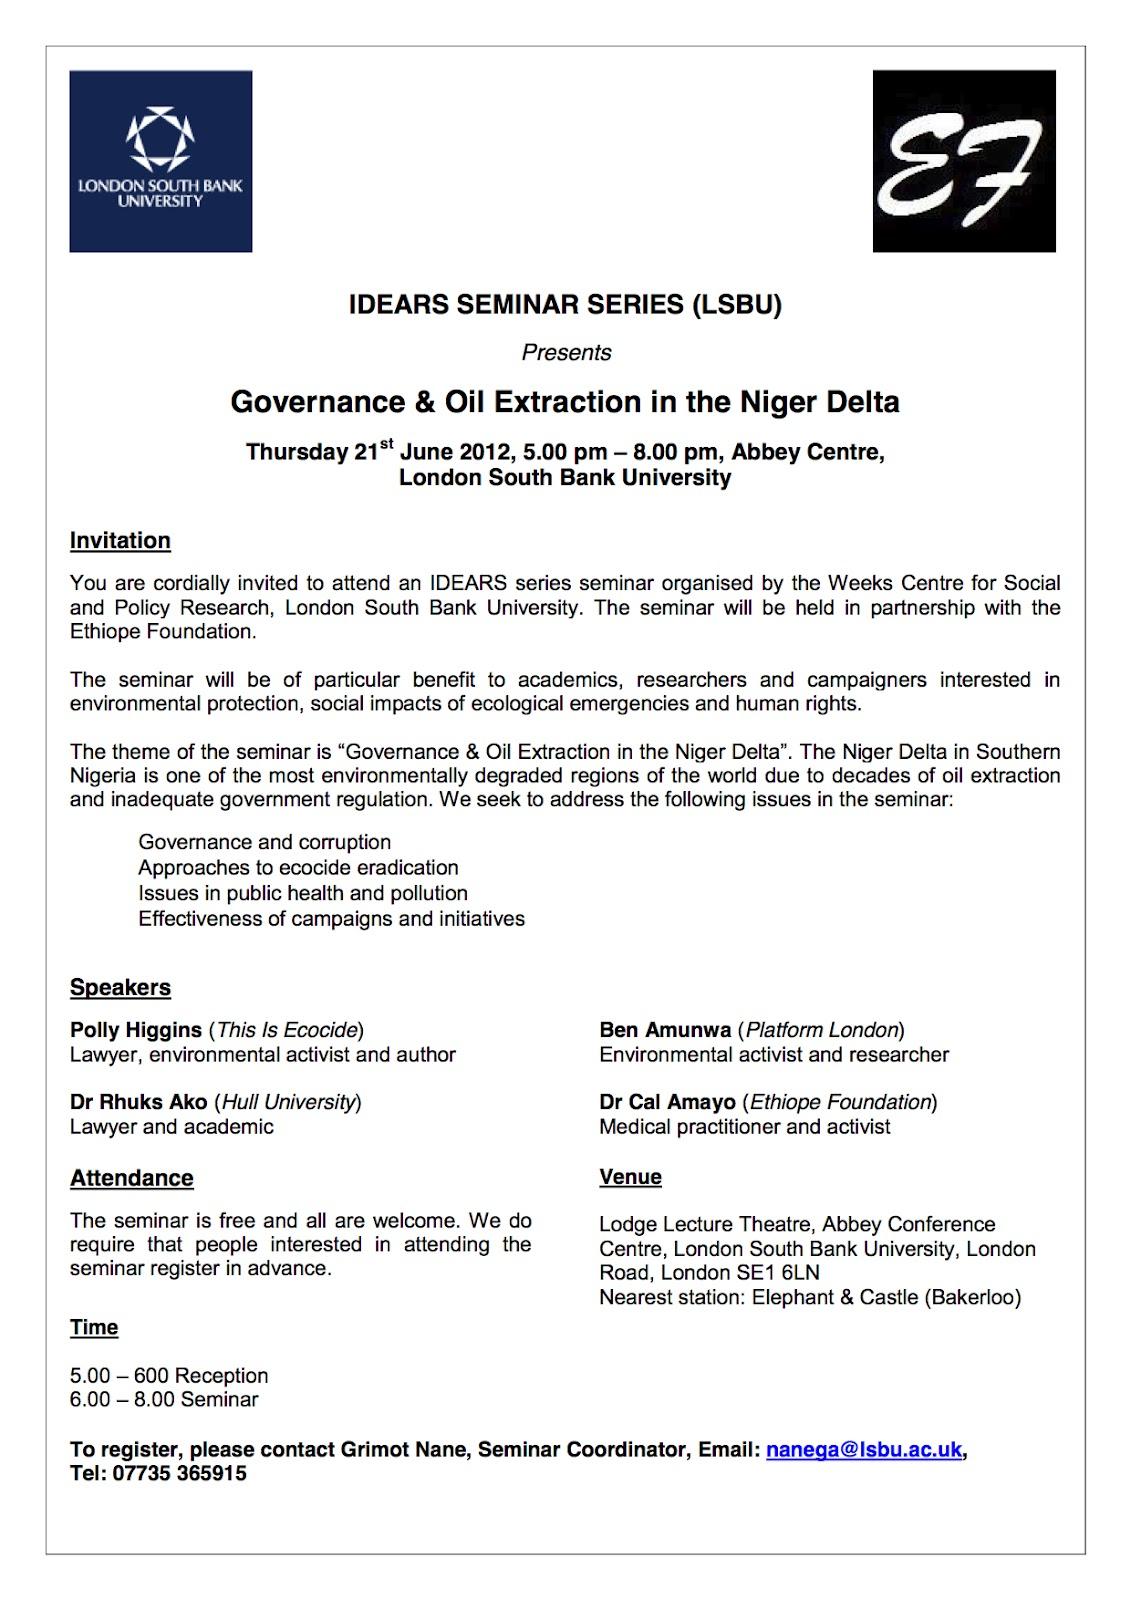 Naijablog niger delta governance seminar coming up in london niger delta governance seminar coming up in london stopboris Images